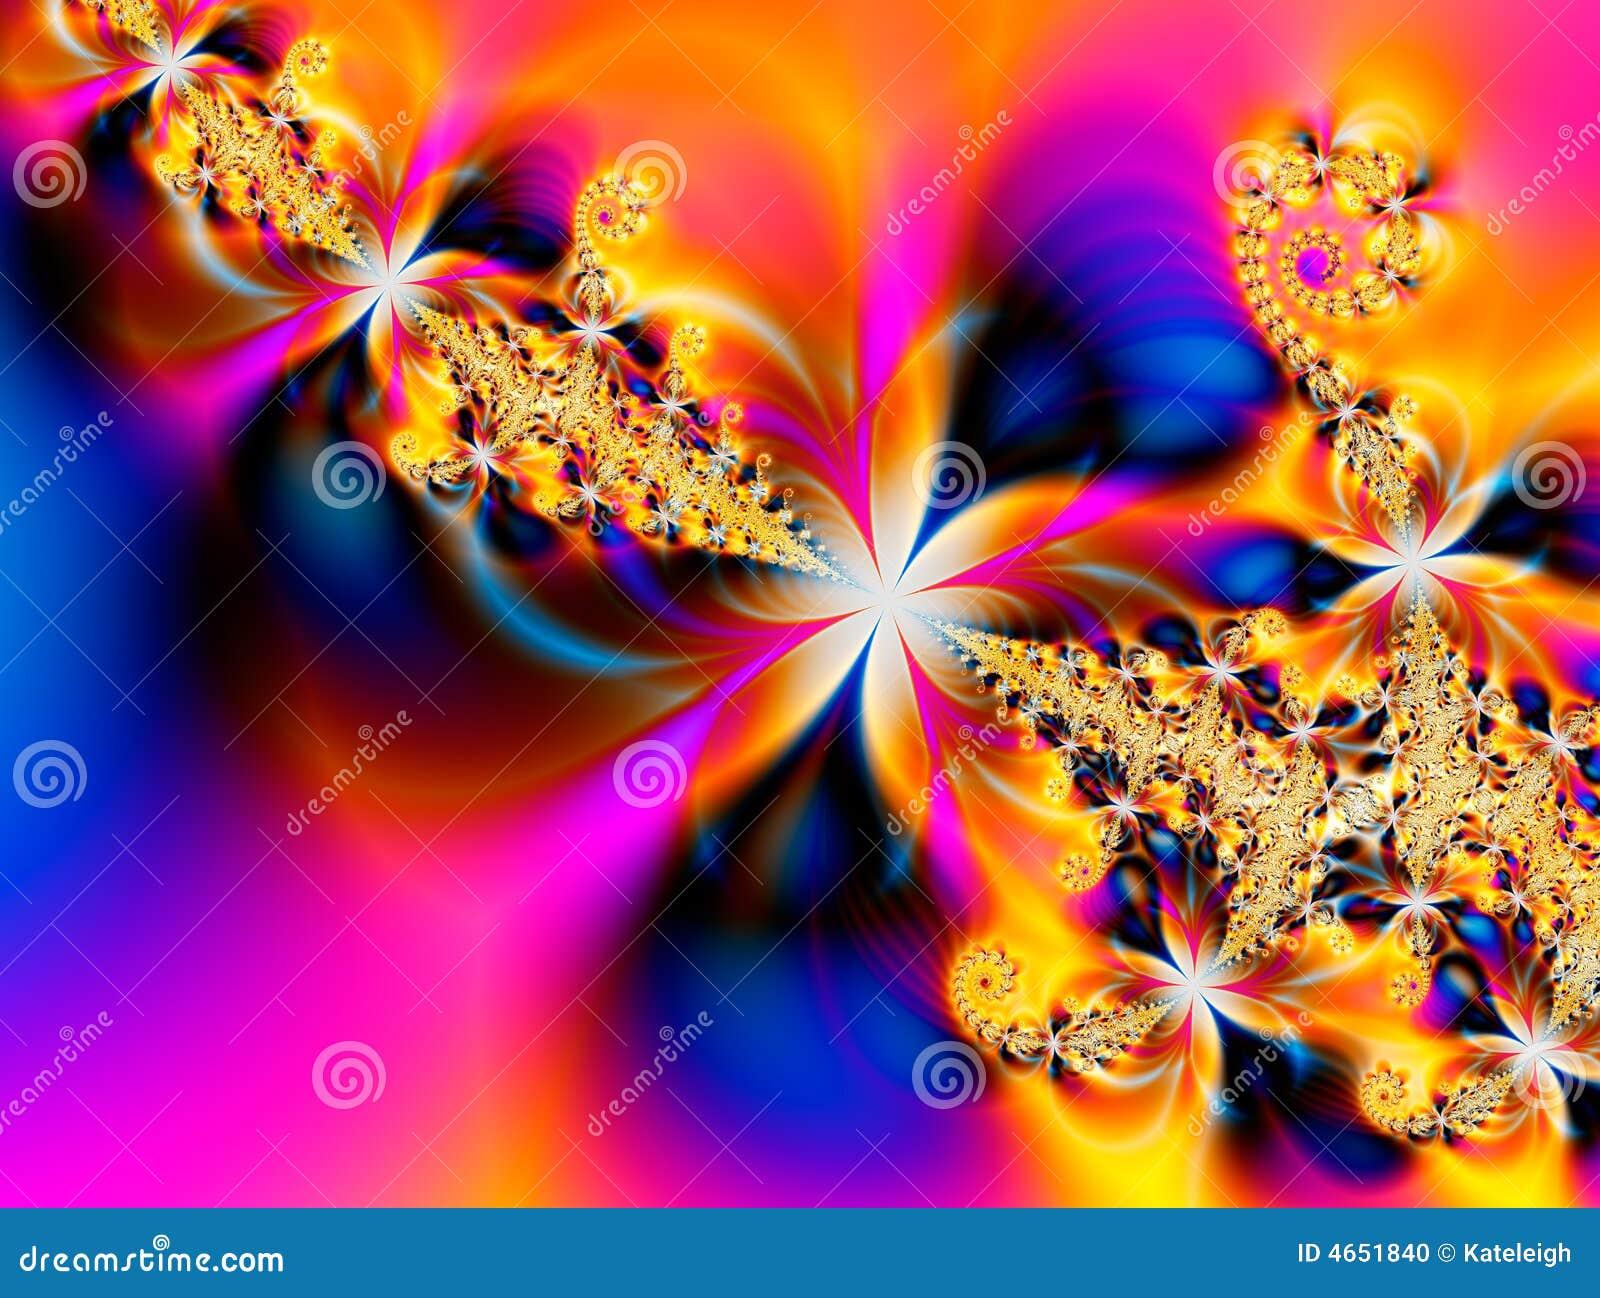 Fractal λουλουδιών κινείται σπειροειδώς τροπικός